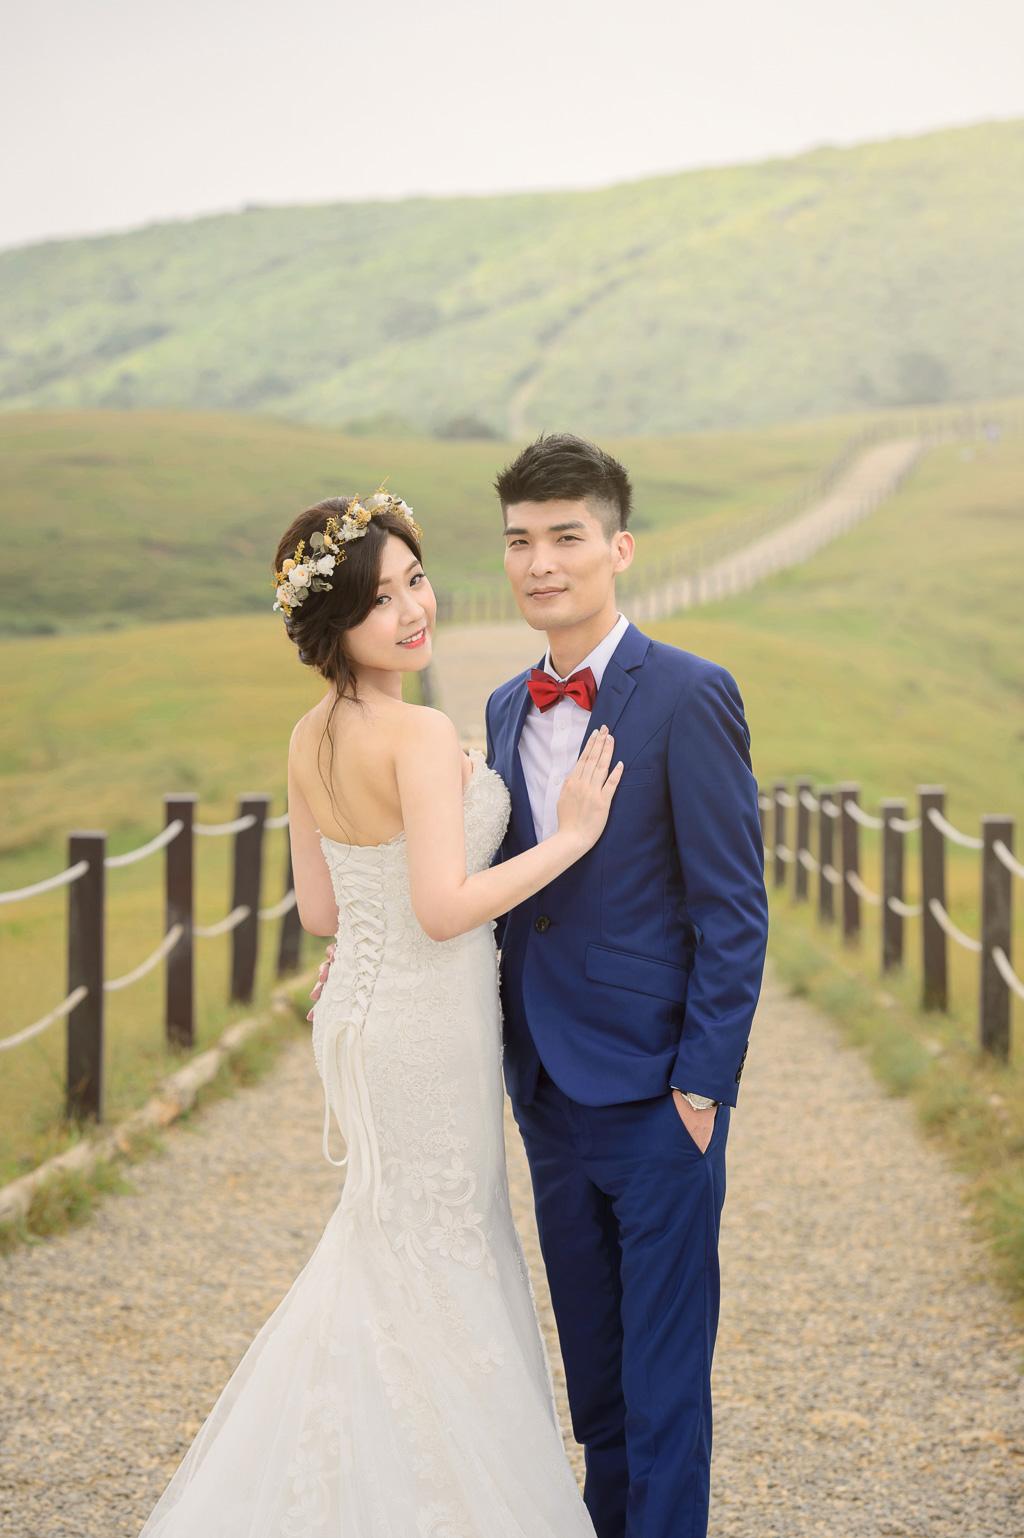 婚攝小勇,小寶團隊, 自助婚紗, even more,wedding day-001